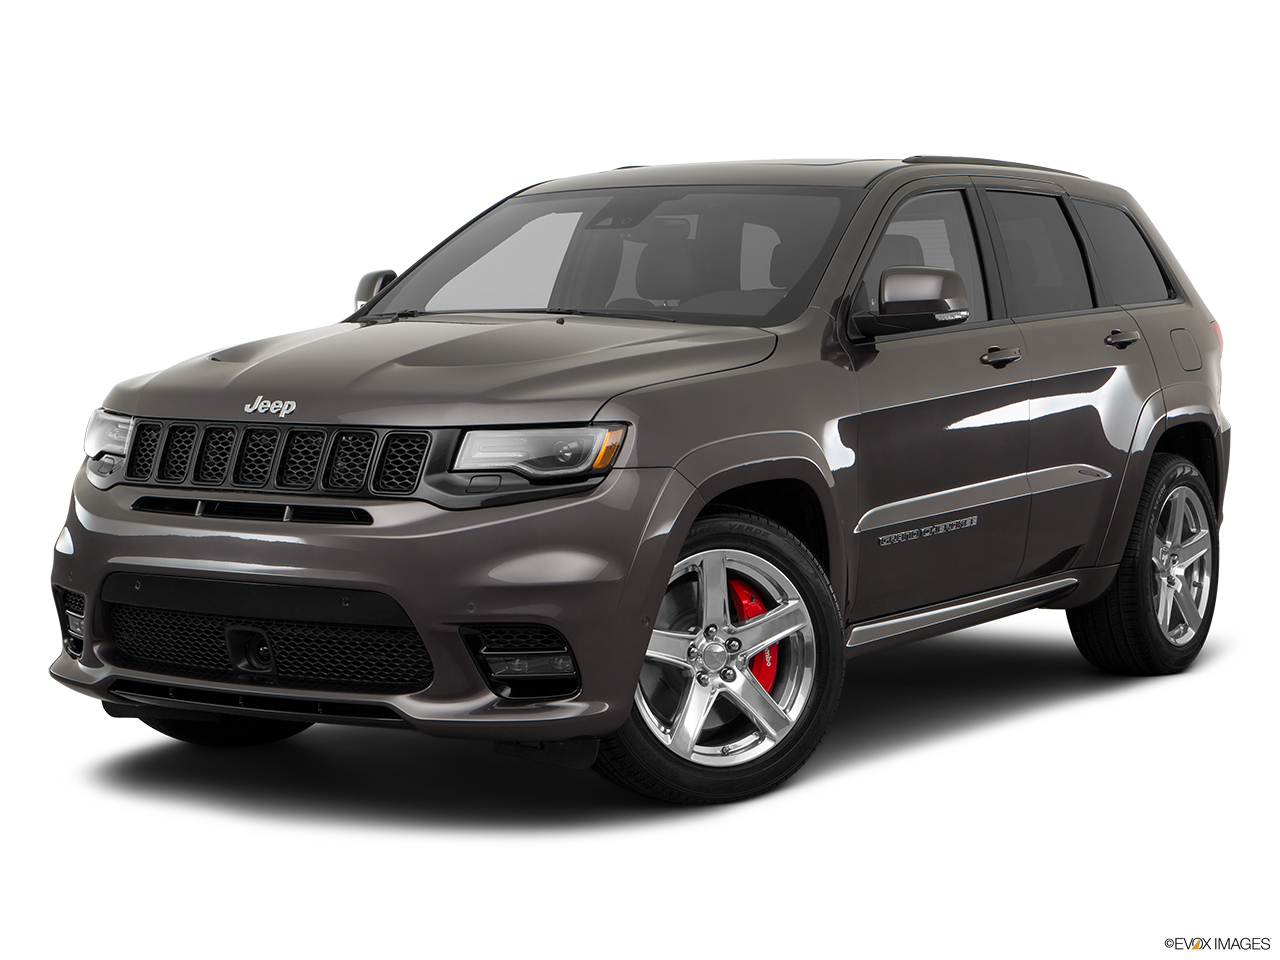 car pictures list for jeep grand cherokee 2017 srt8 uae yallamotor. Black Bedroom Furniture Sets. Home Design Ideas